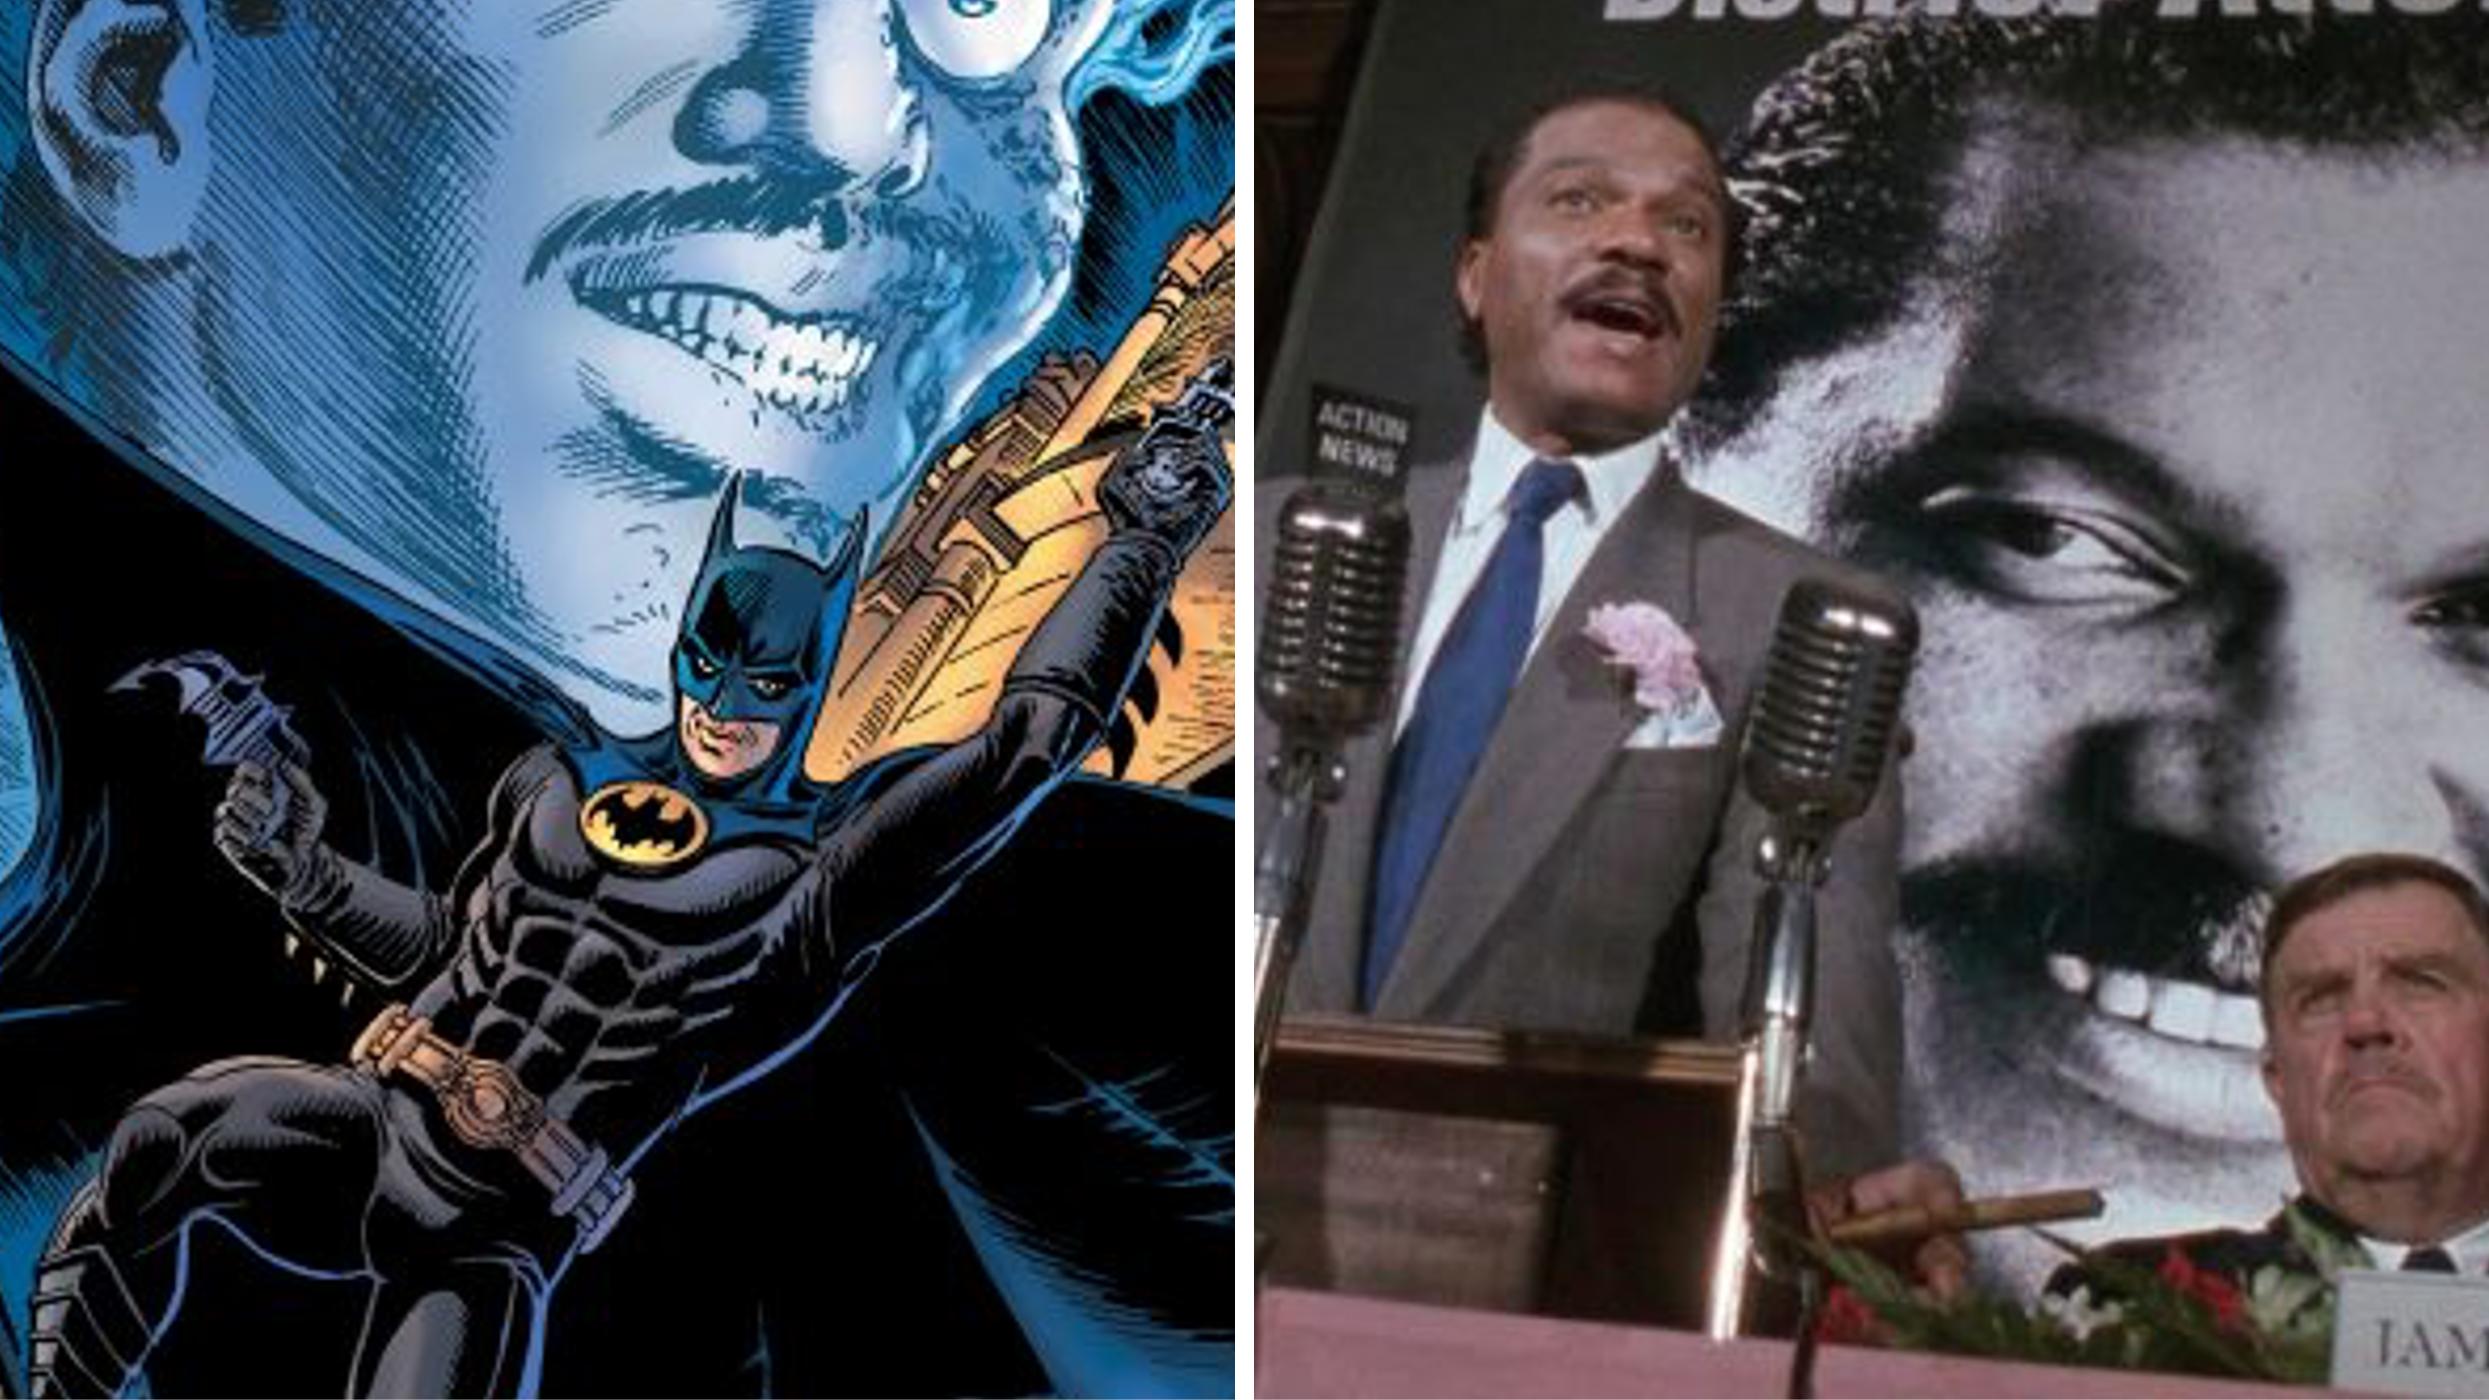 Batman 89' Reveals Billy Dee Williams as Two-Face